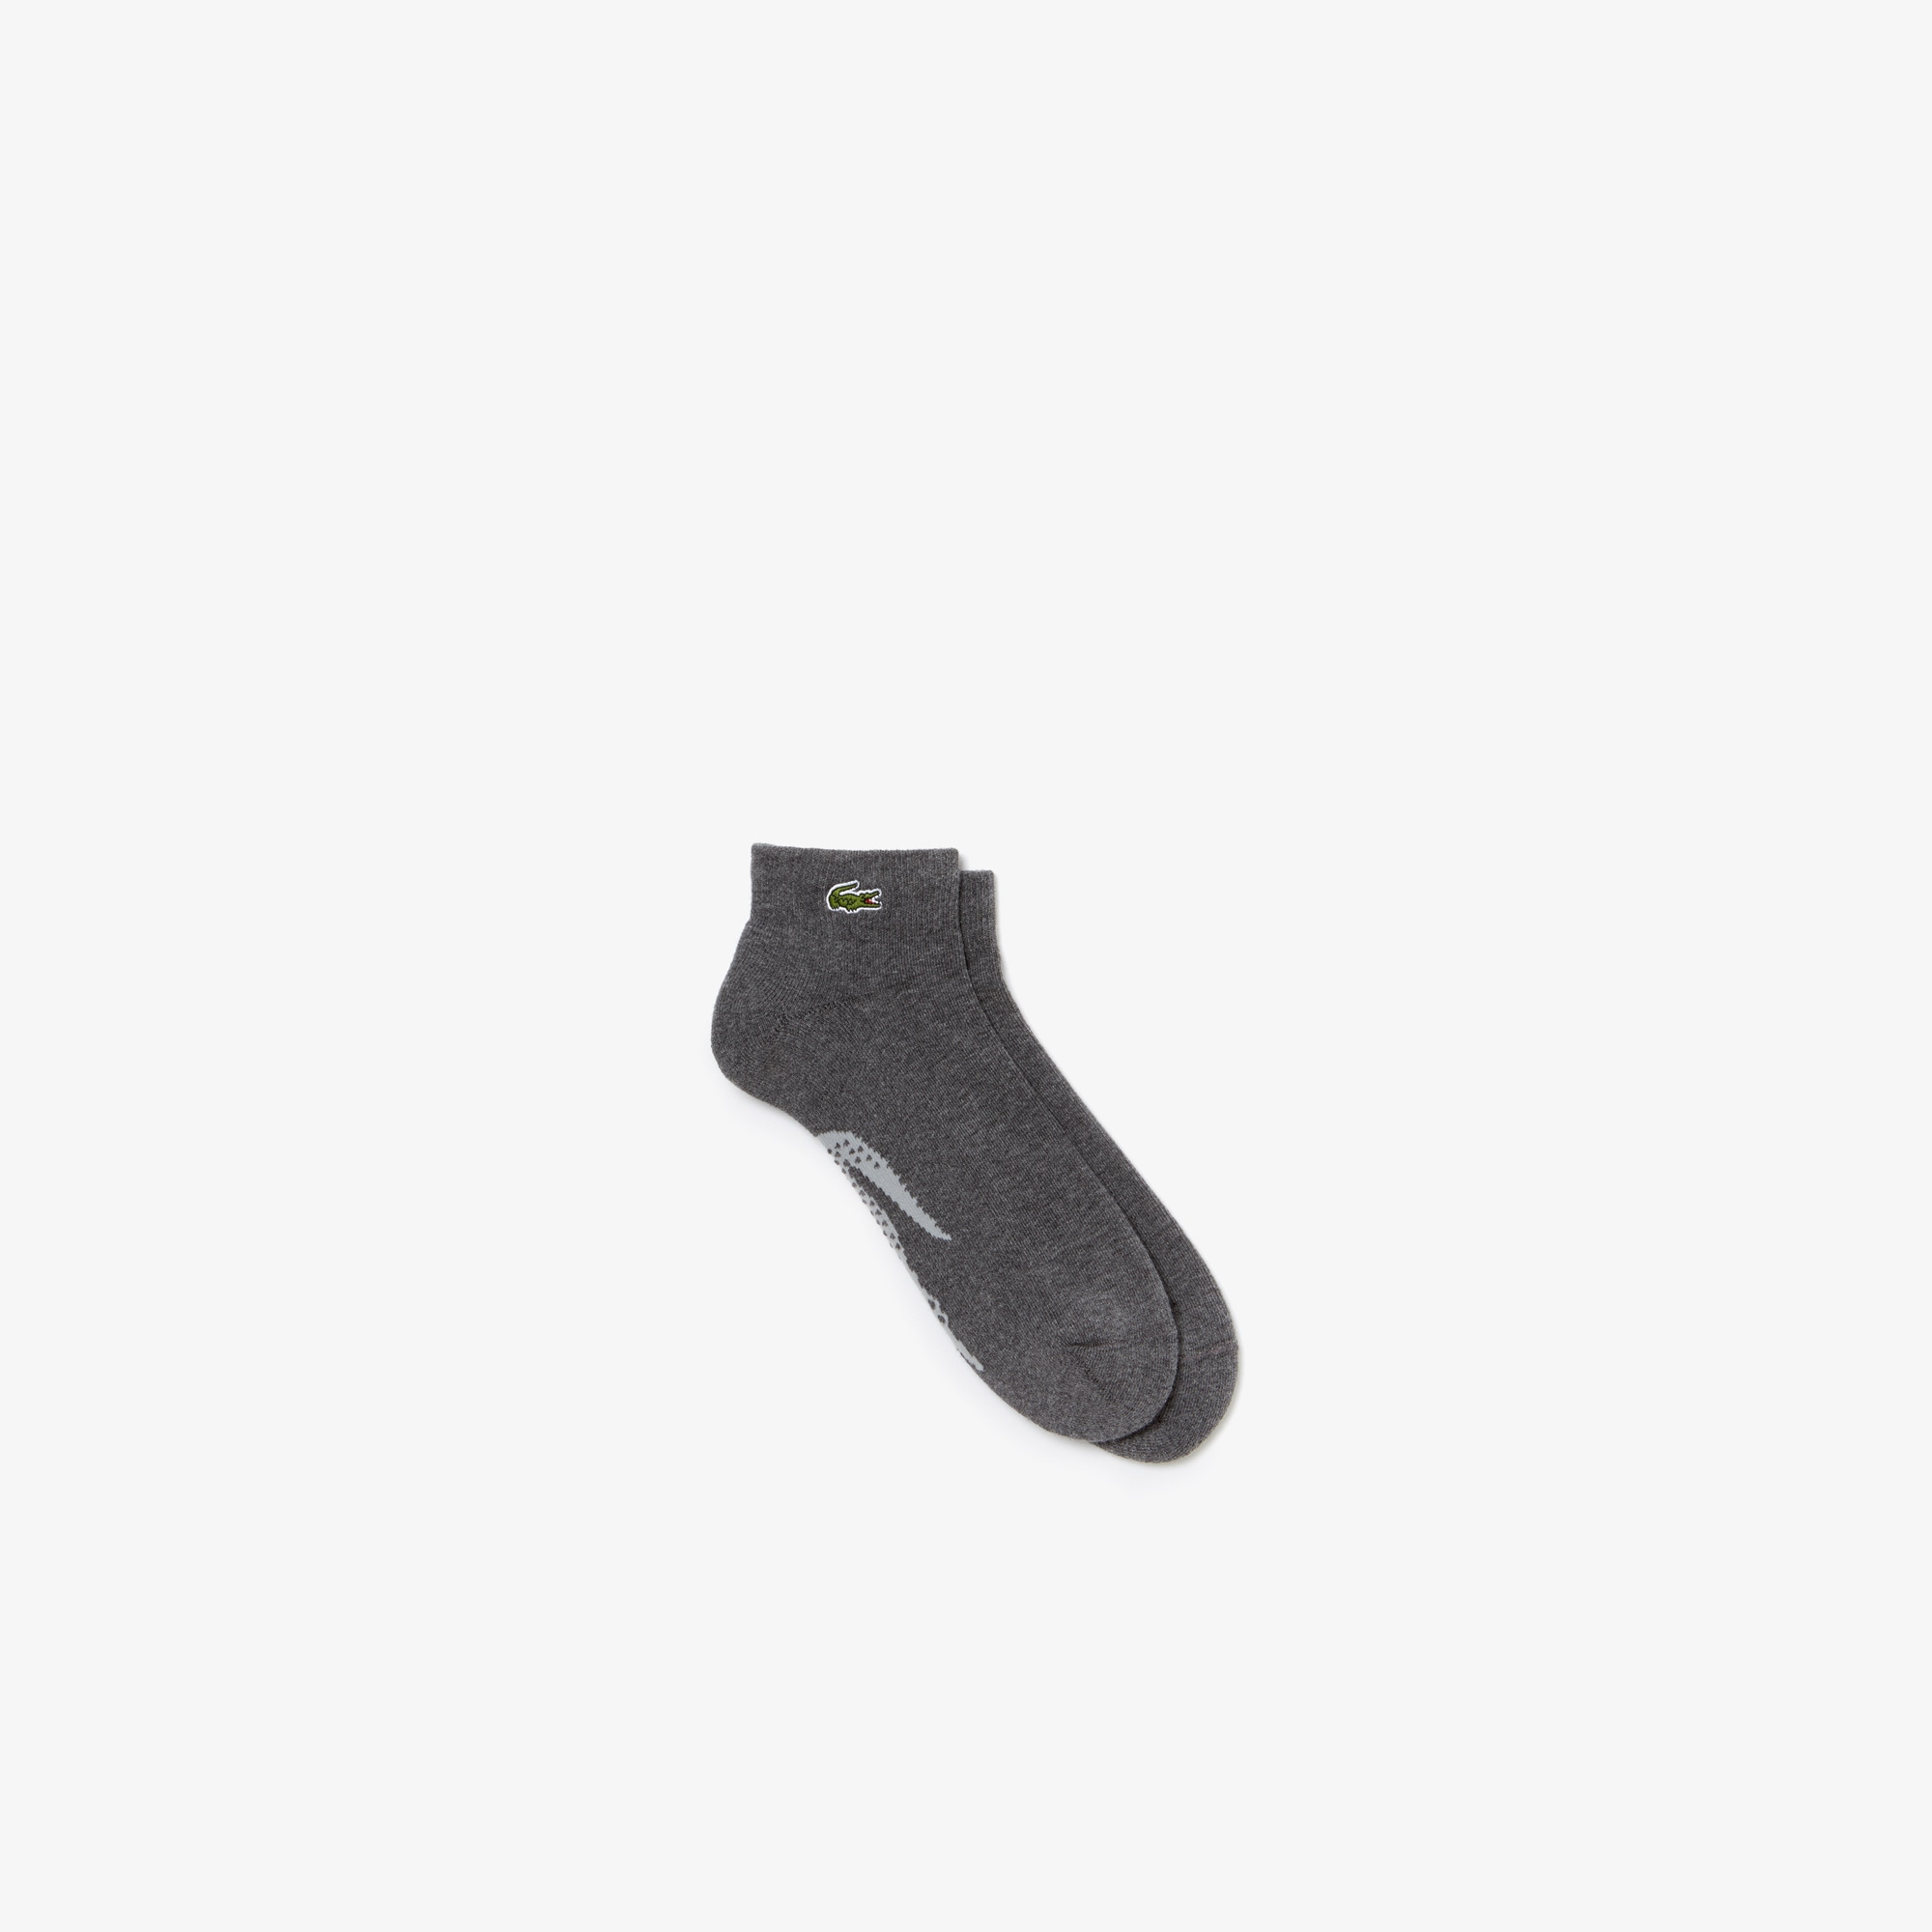 Men's Lacoste SPORT Tennis XL Crocodile Terrycloth Socks